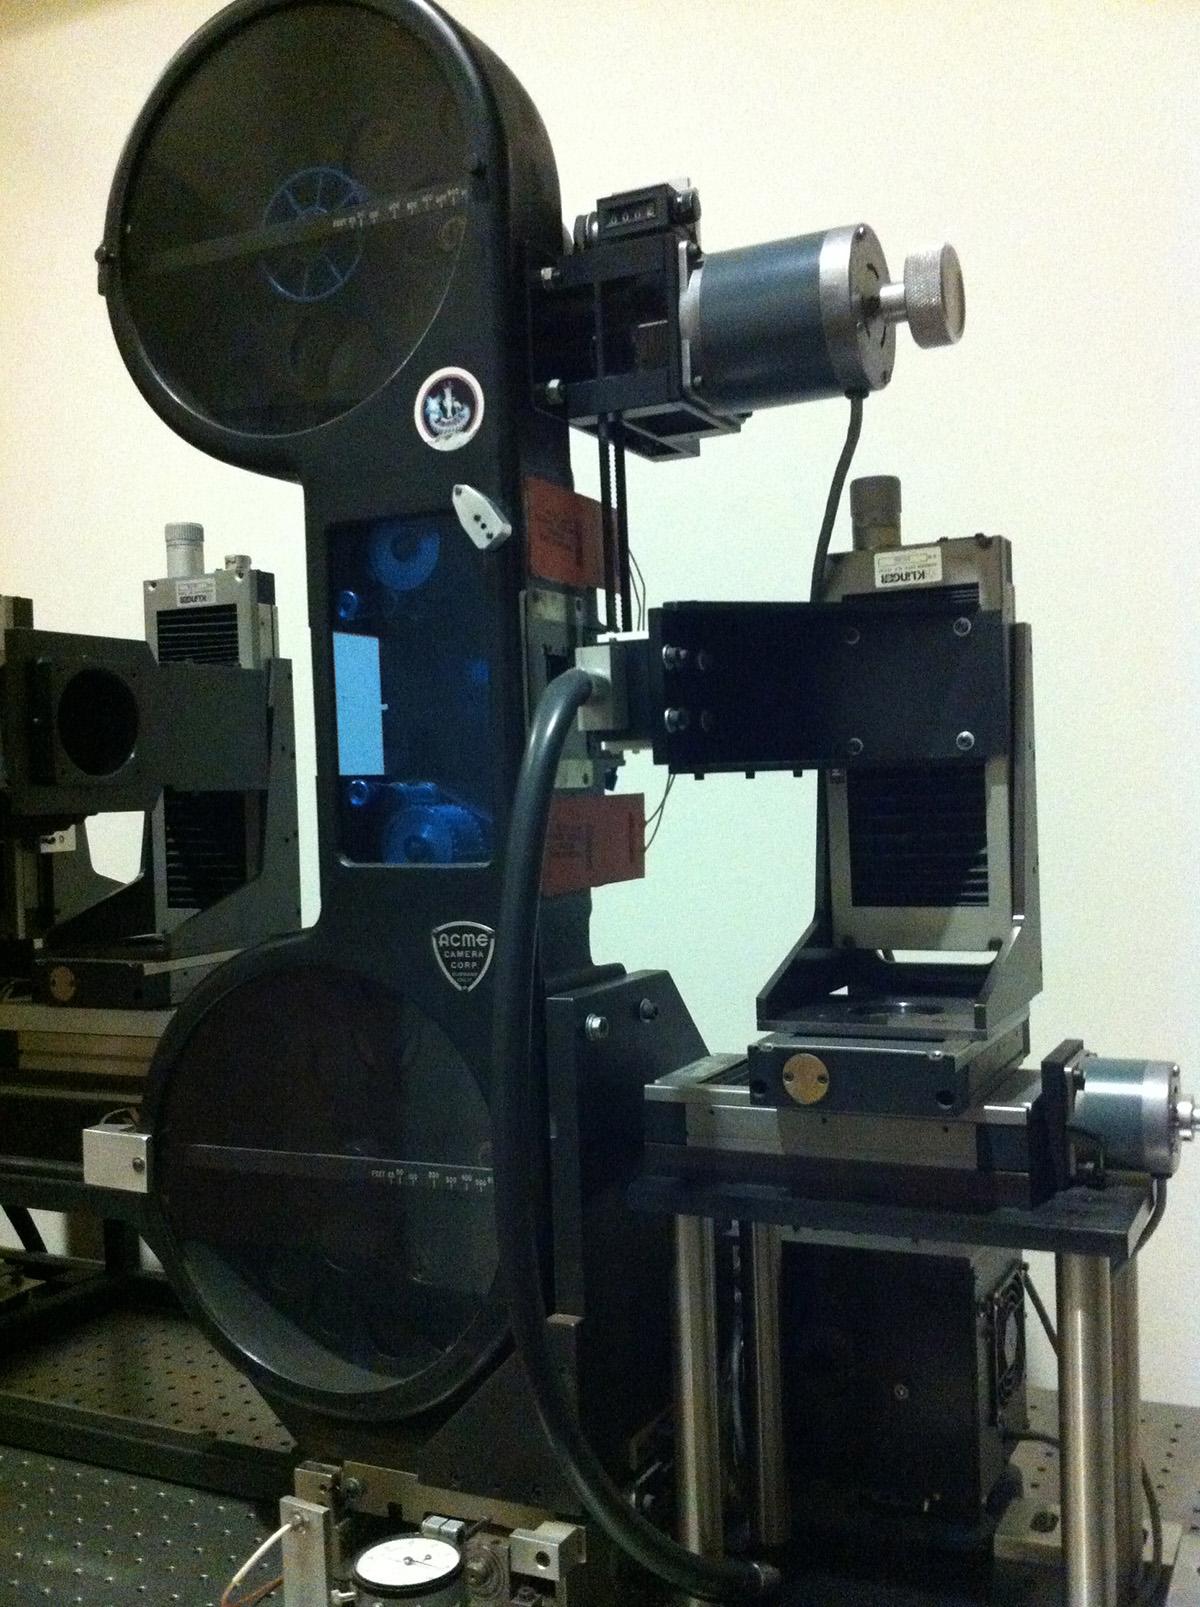 ILM's film scanner